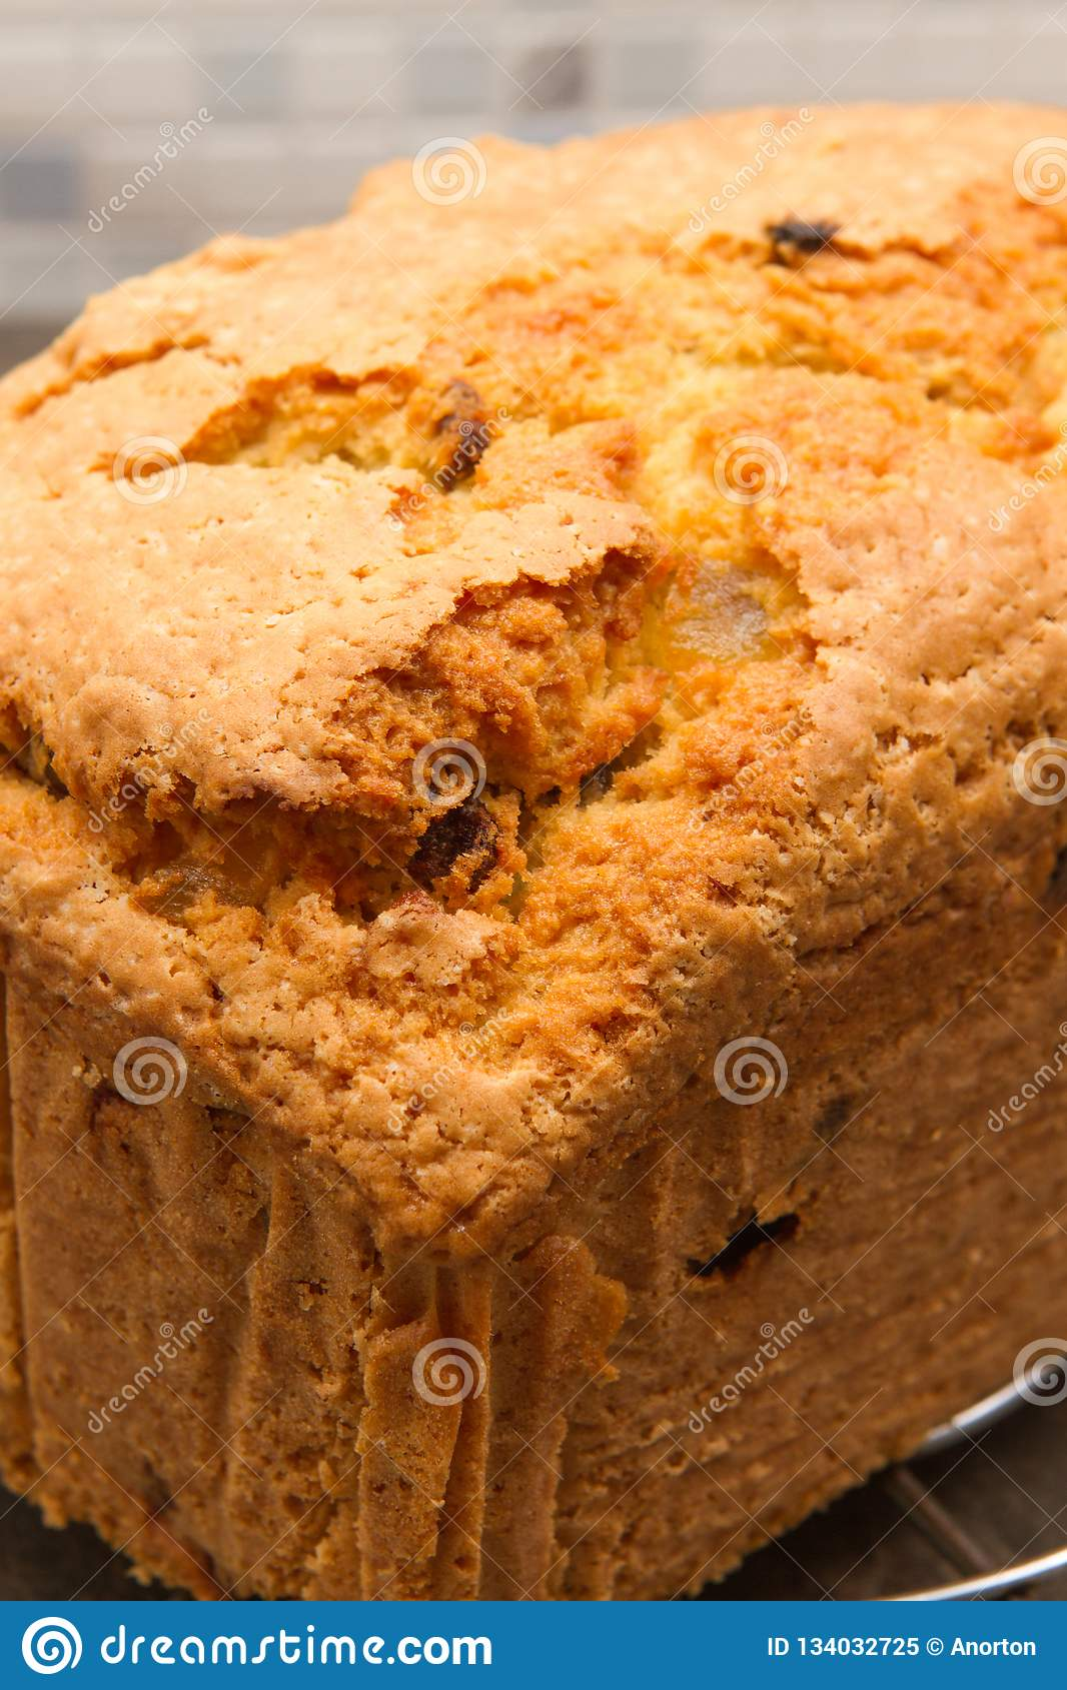 Traditional fruit loaf A traditional British fruit loaf